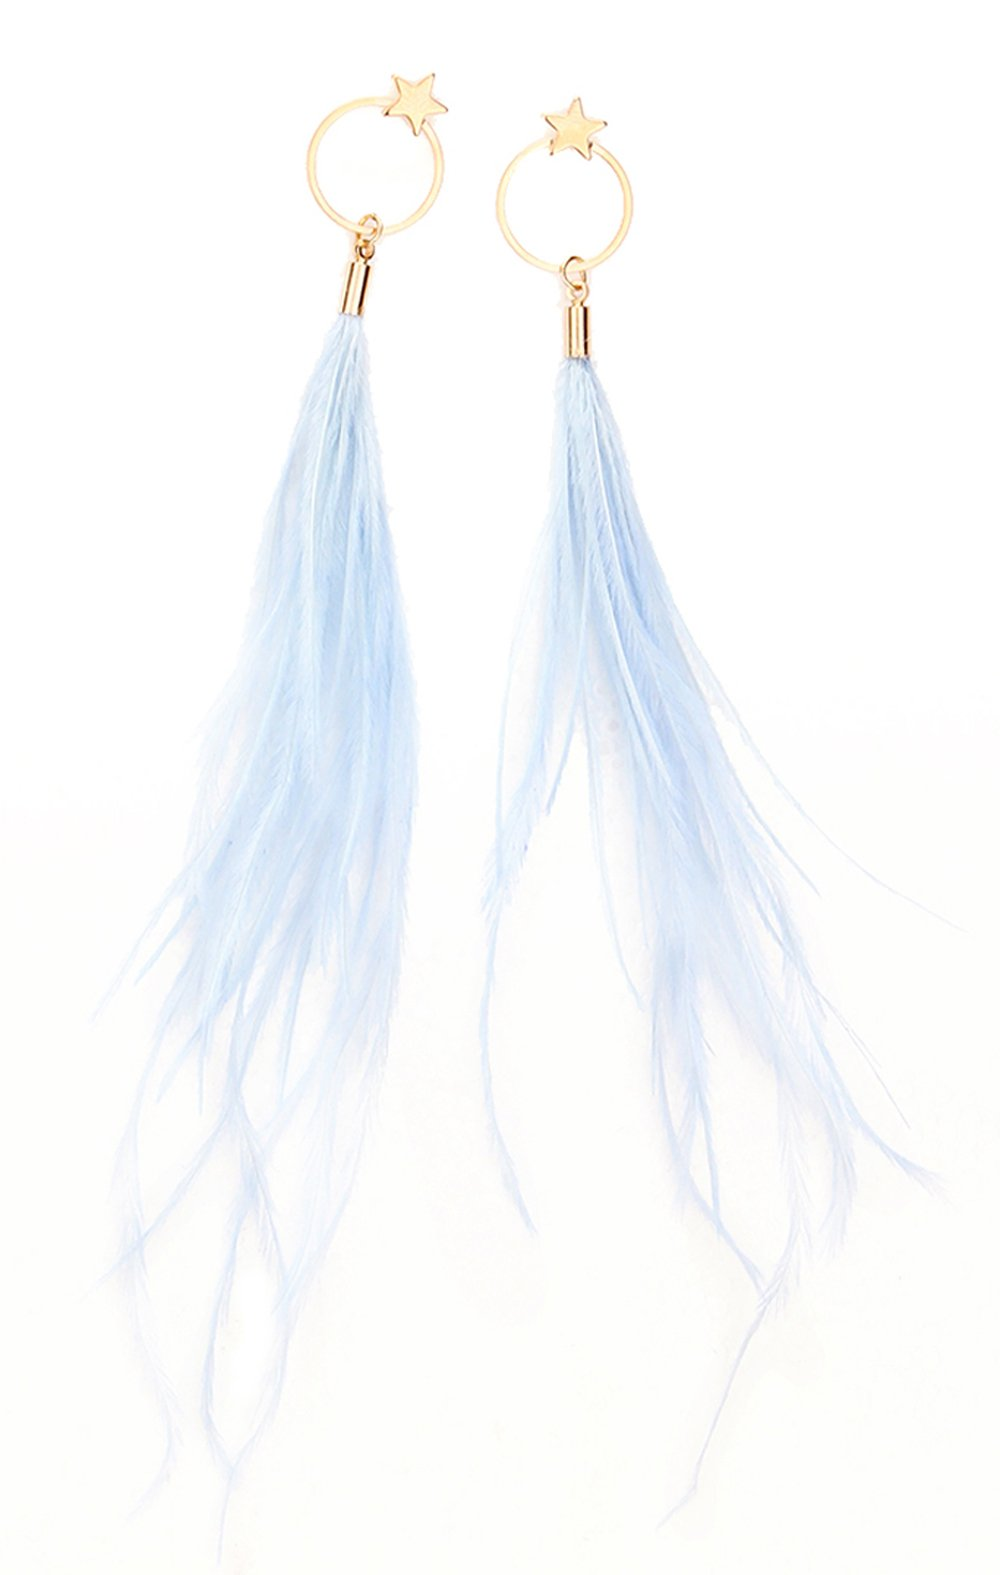 Fashion Boho Elegant Thread Dangle Earrings Star&Round Embellishment Handmade Feather Jewelry Blue